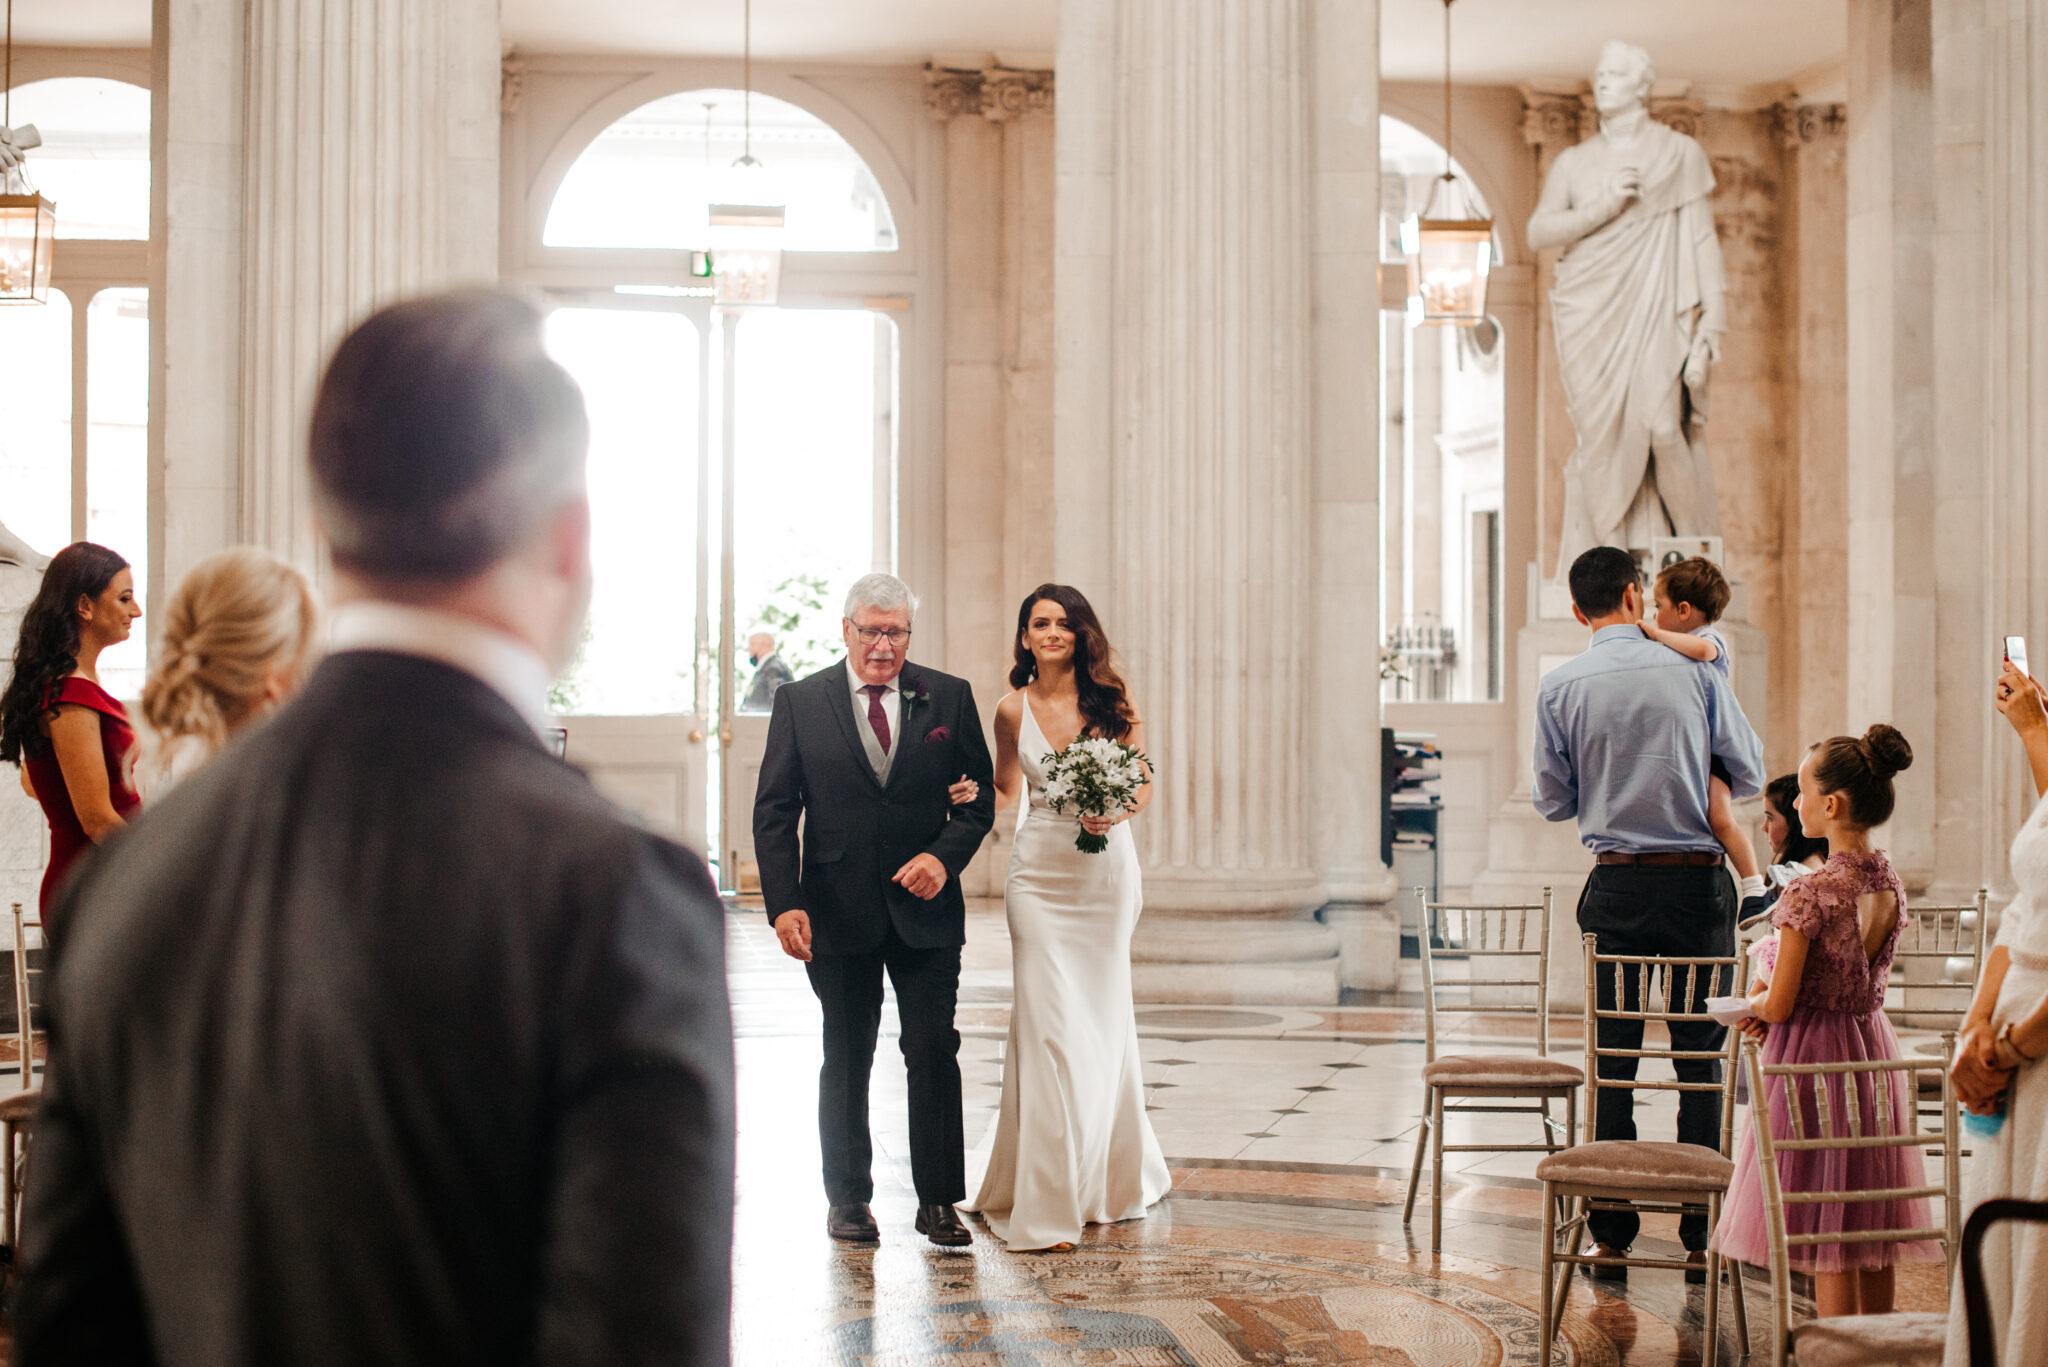 City Hall Wedding Photos Intercontinental Hotel Dublin 9